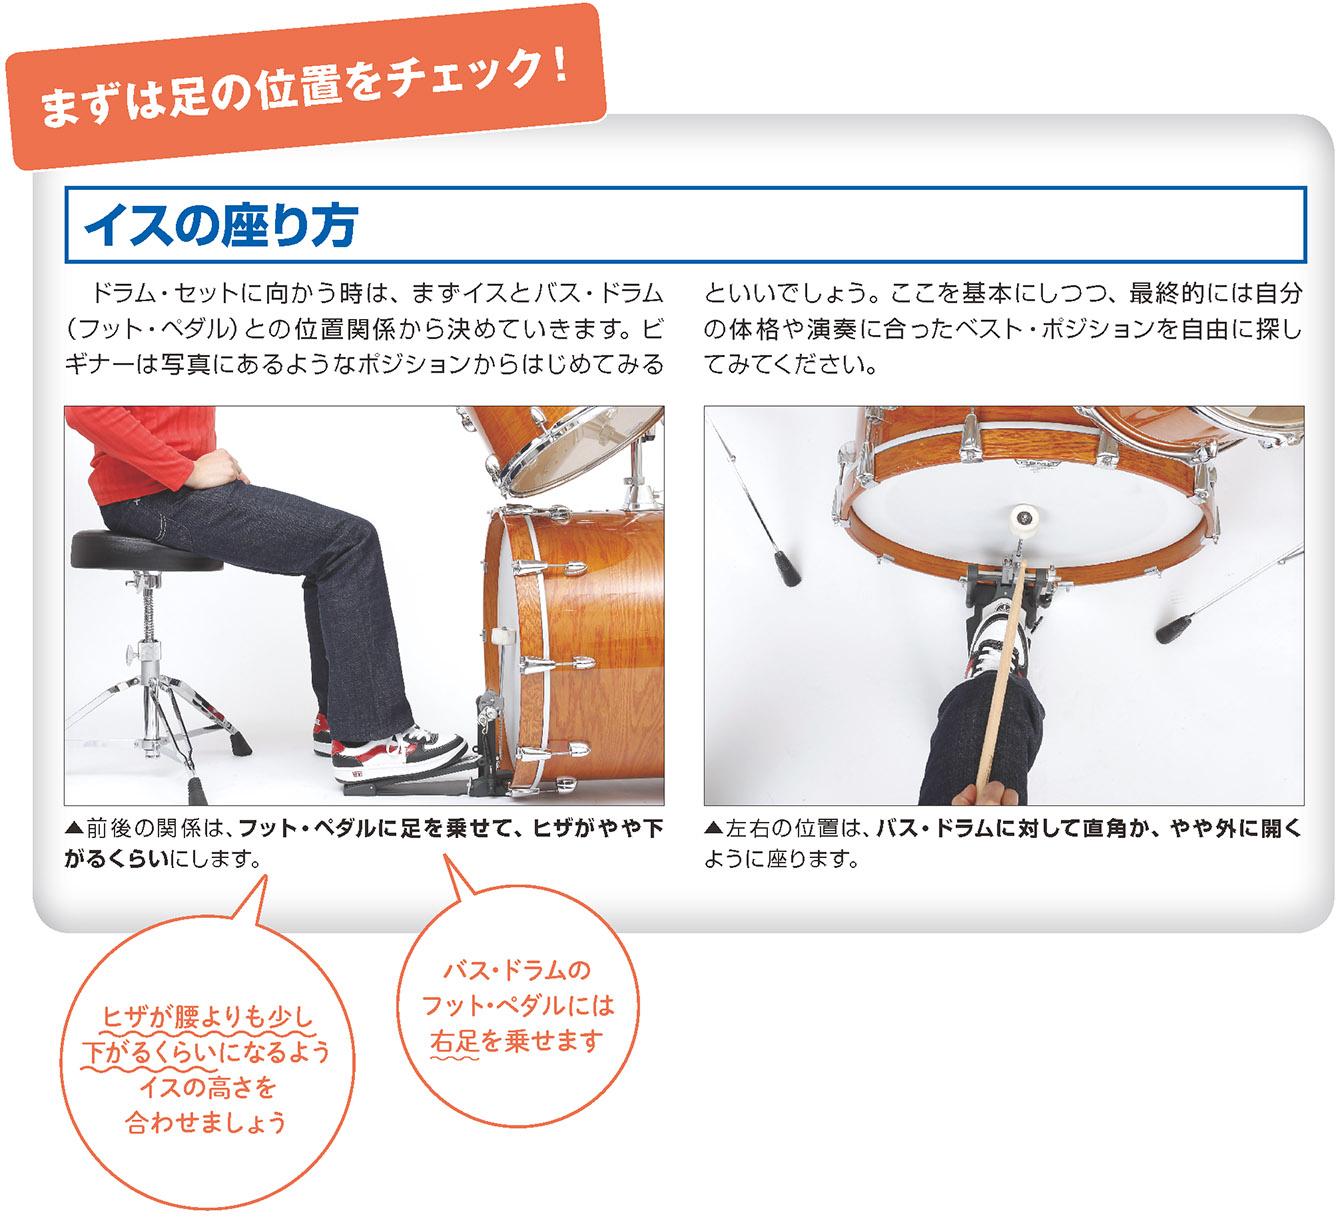 http://musicschool-navi.jp/columns/keion_v1_dr01.jpg